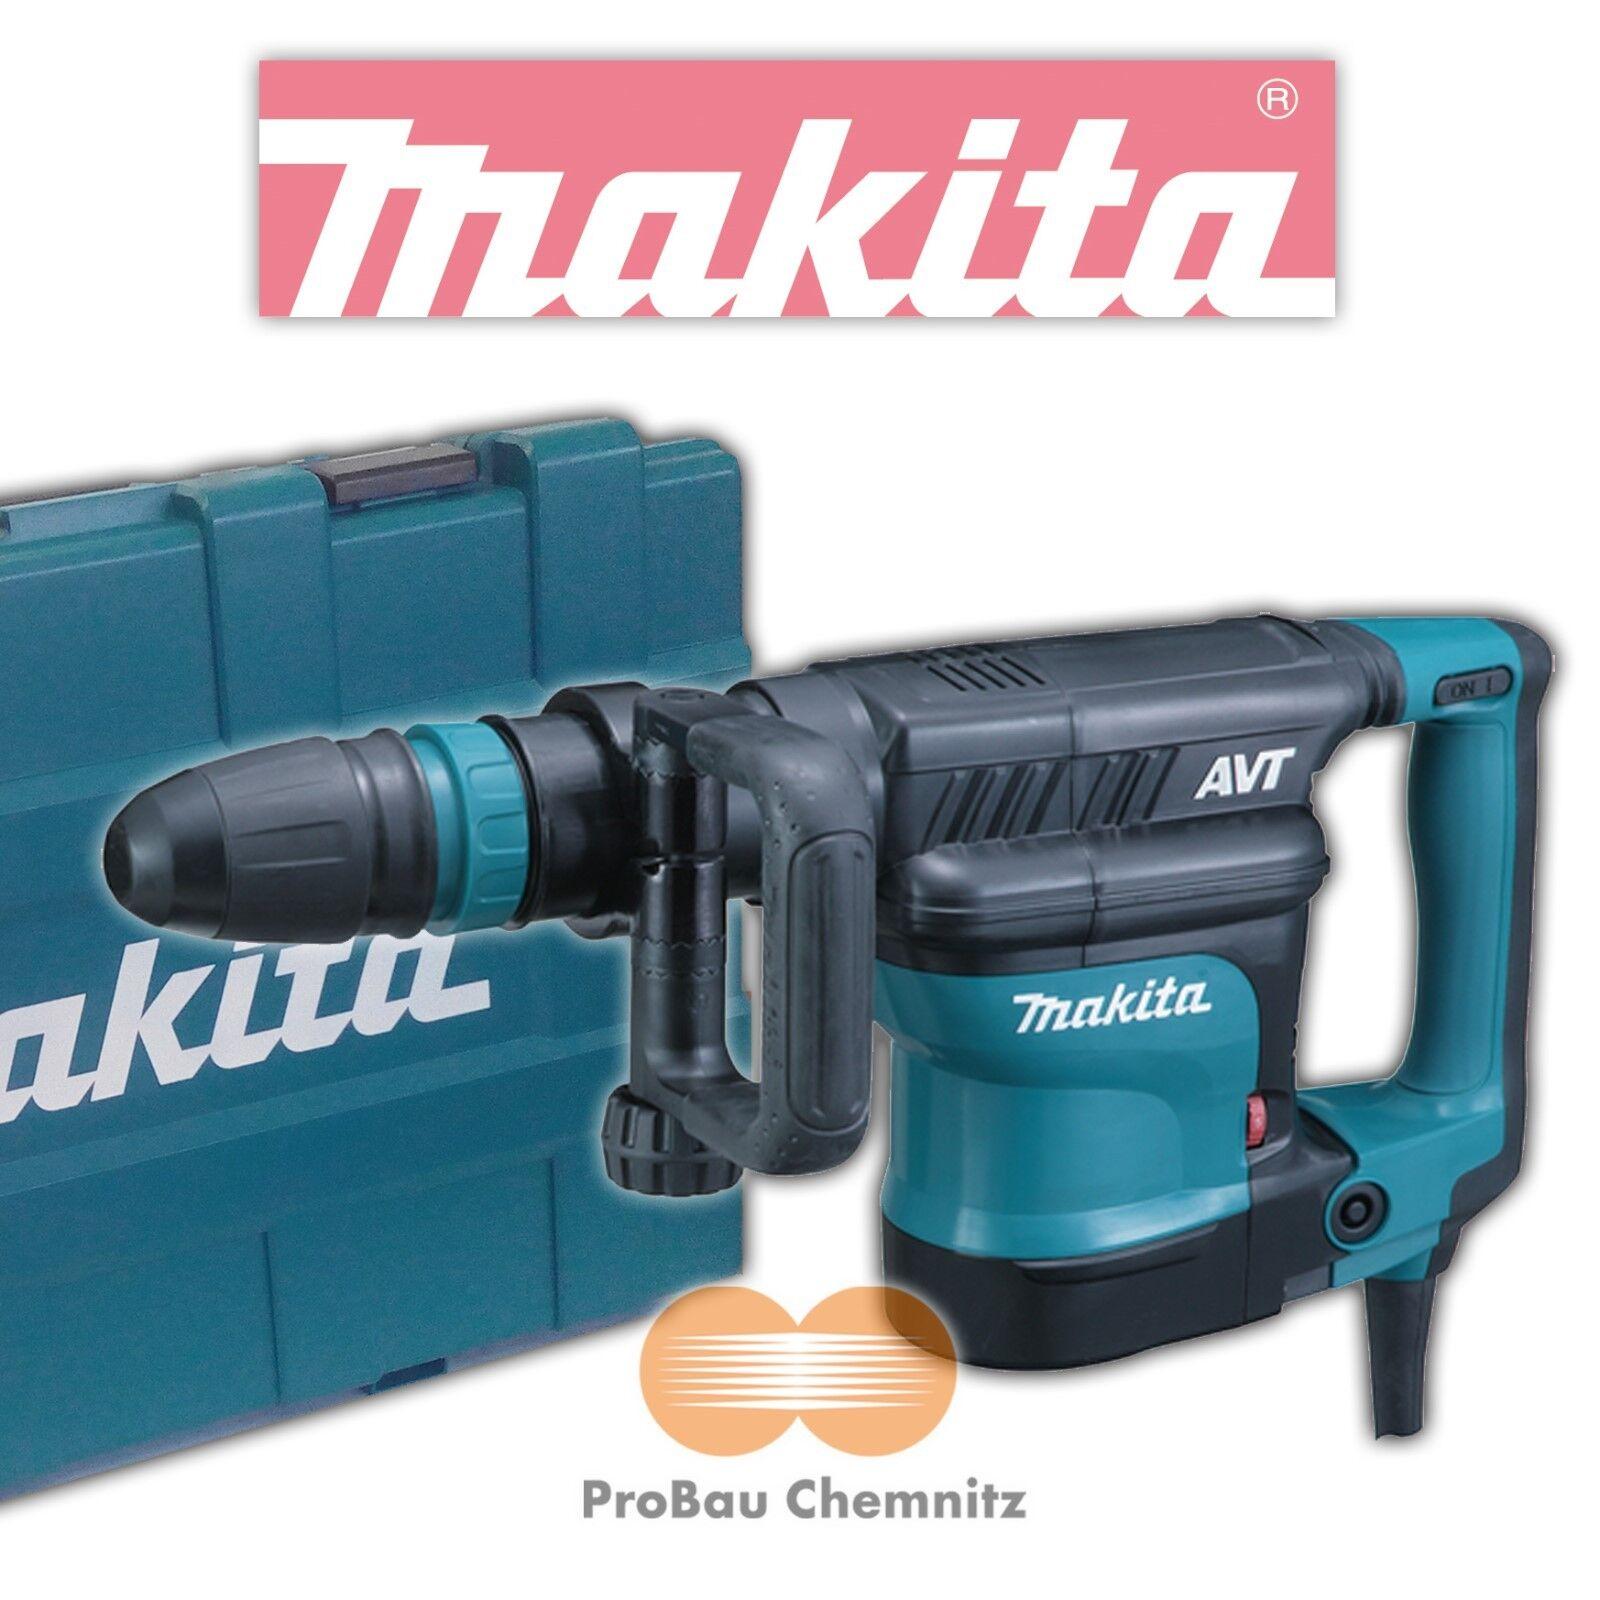 Makita Stemmhammer HM1111C, 8,0 kg  im Koffer HM 1111 C Abbruchhammer SDS-Max